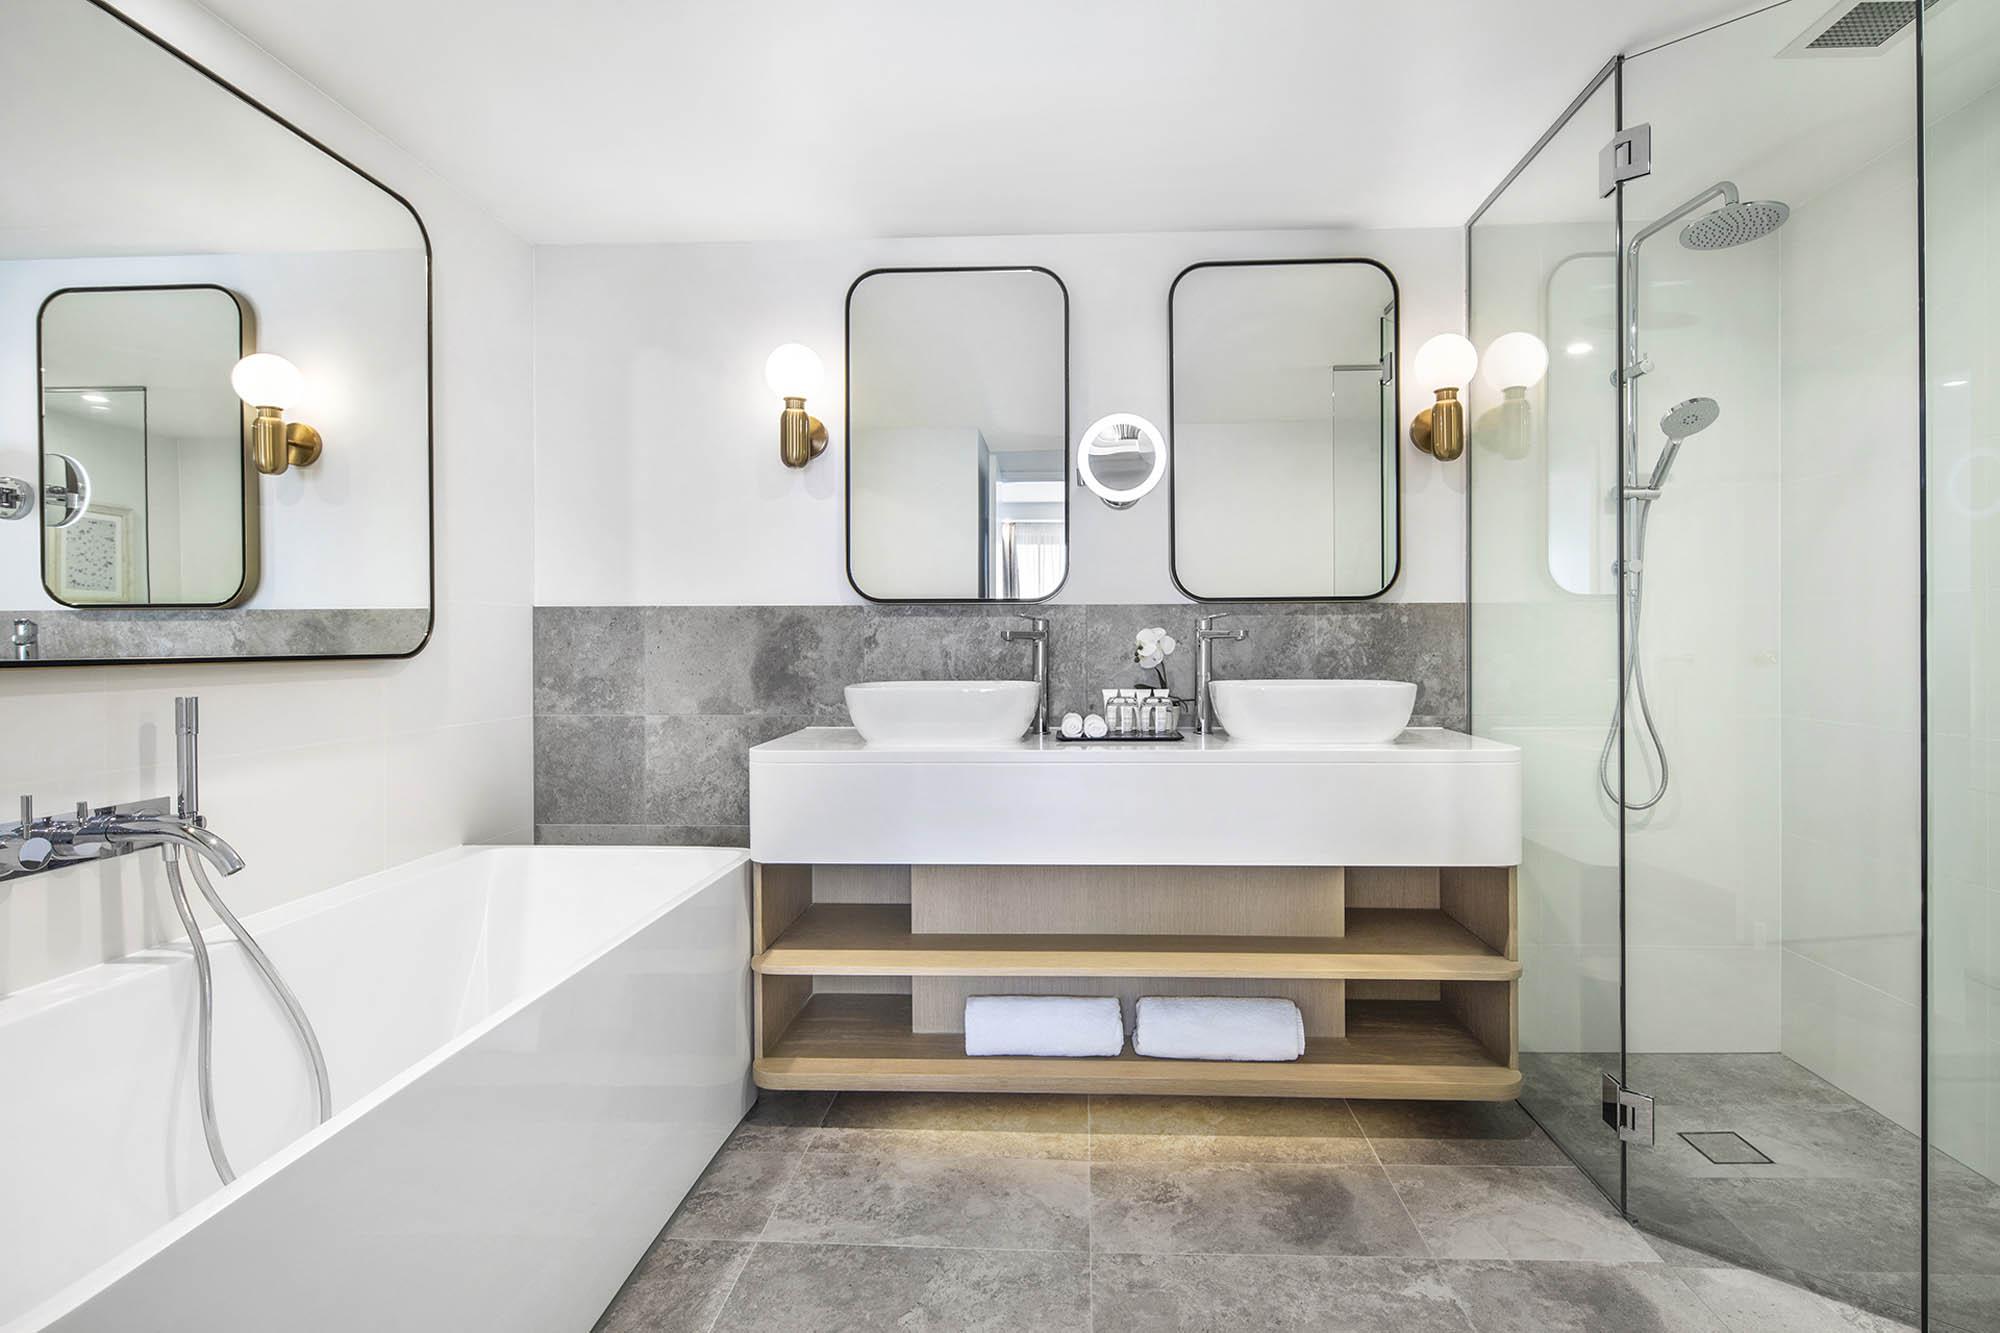 Crowne Plaza Coogee Beach hotel hospitality tourism sydney construction fitout seaside suite bathroom vanity bathtub shower vanity mirrors